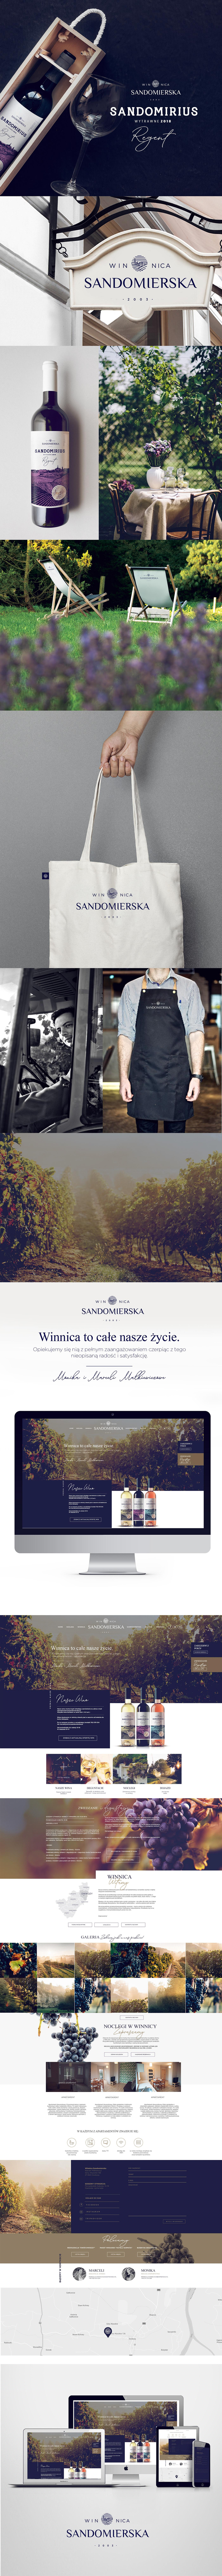 vineyard wine logo sandomierz city labels